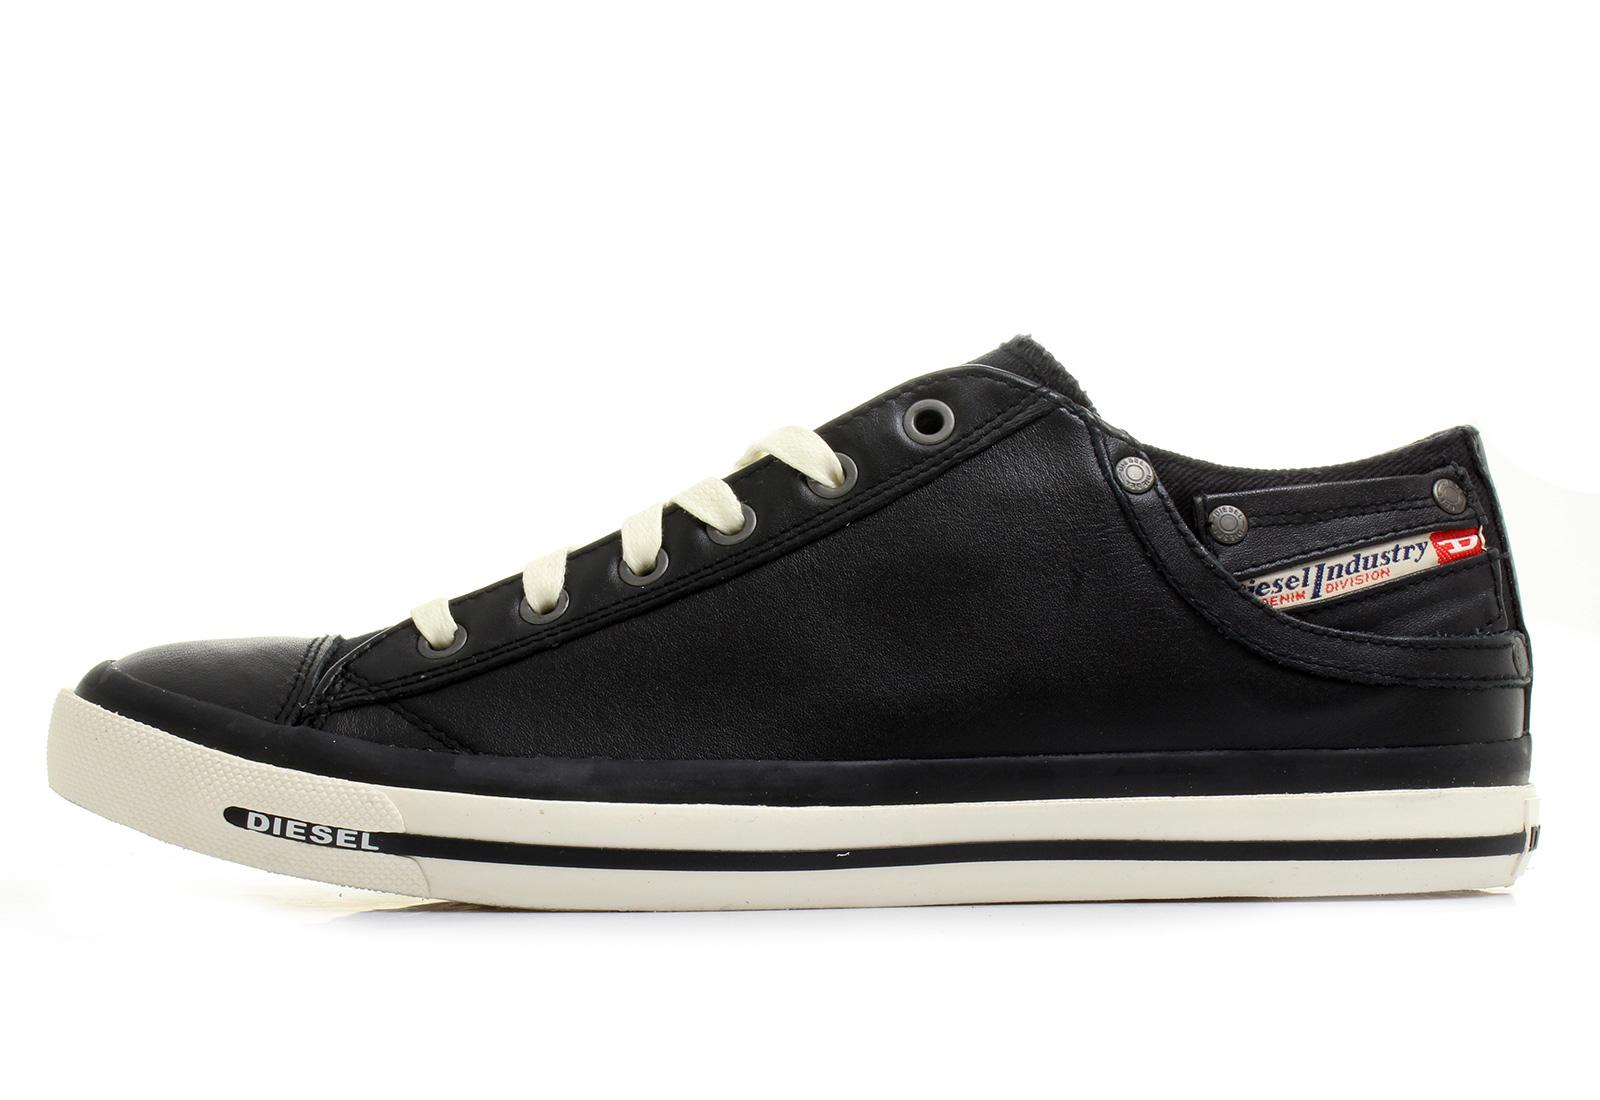 Diesel Shoes - Exposure Low I - 321-052-8013 - Online shop ...